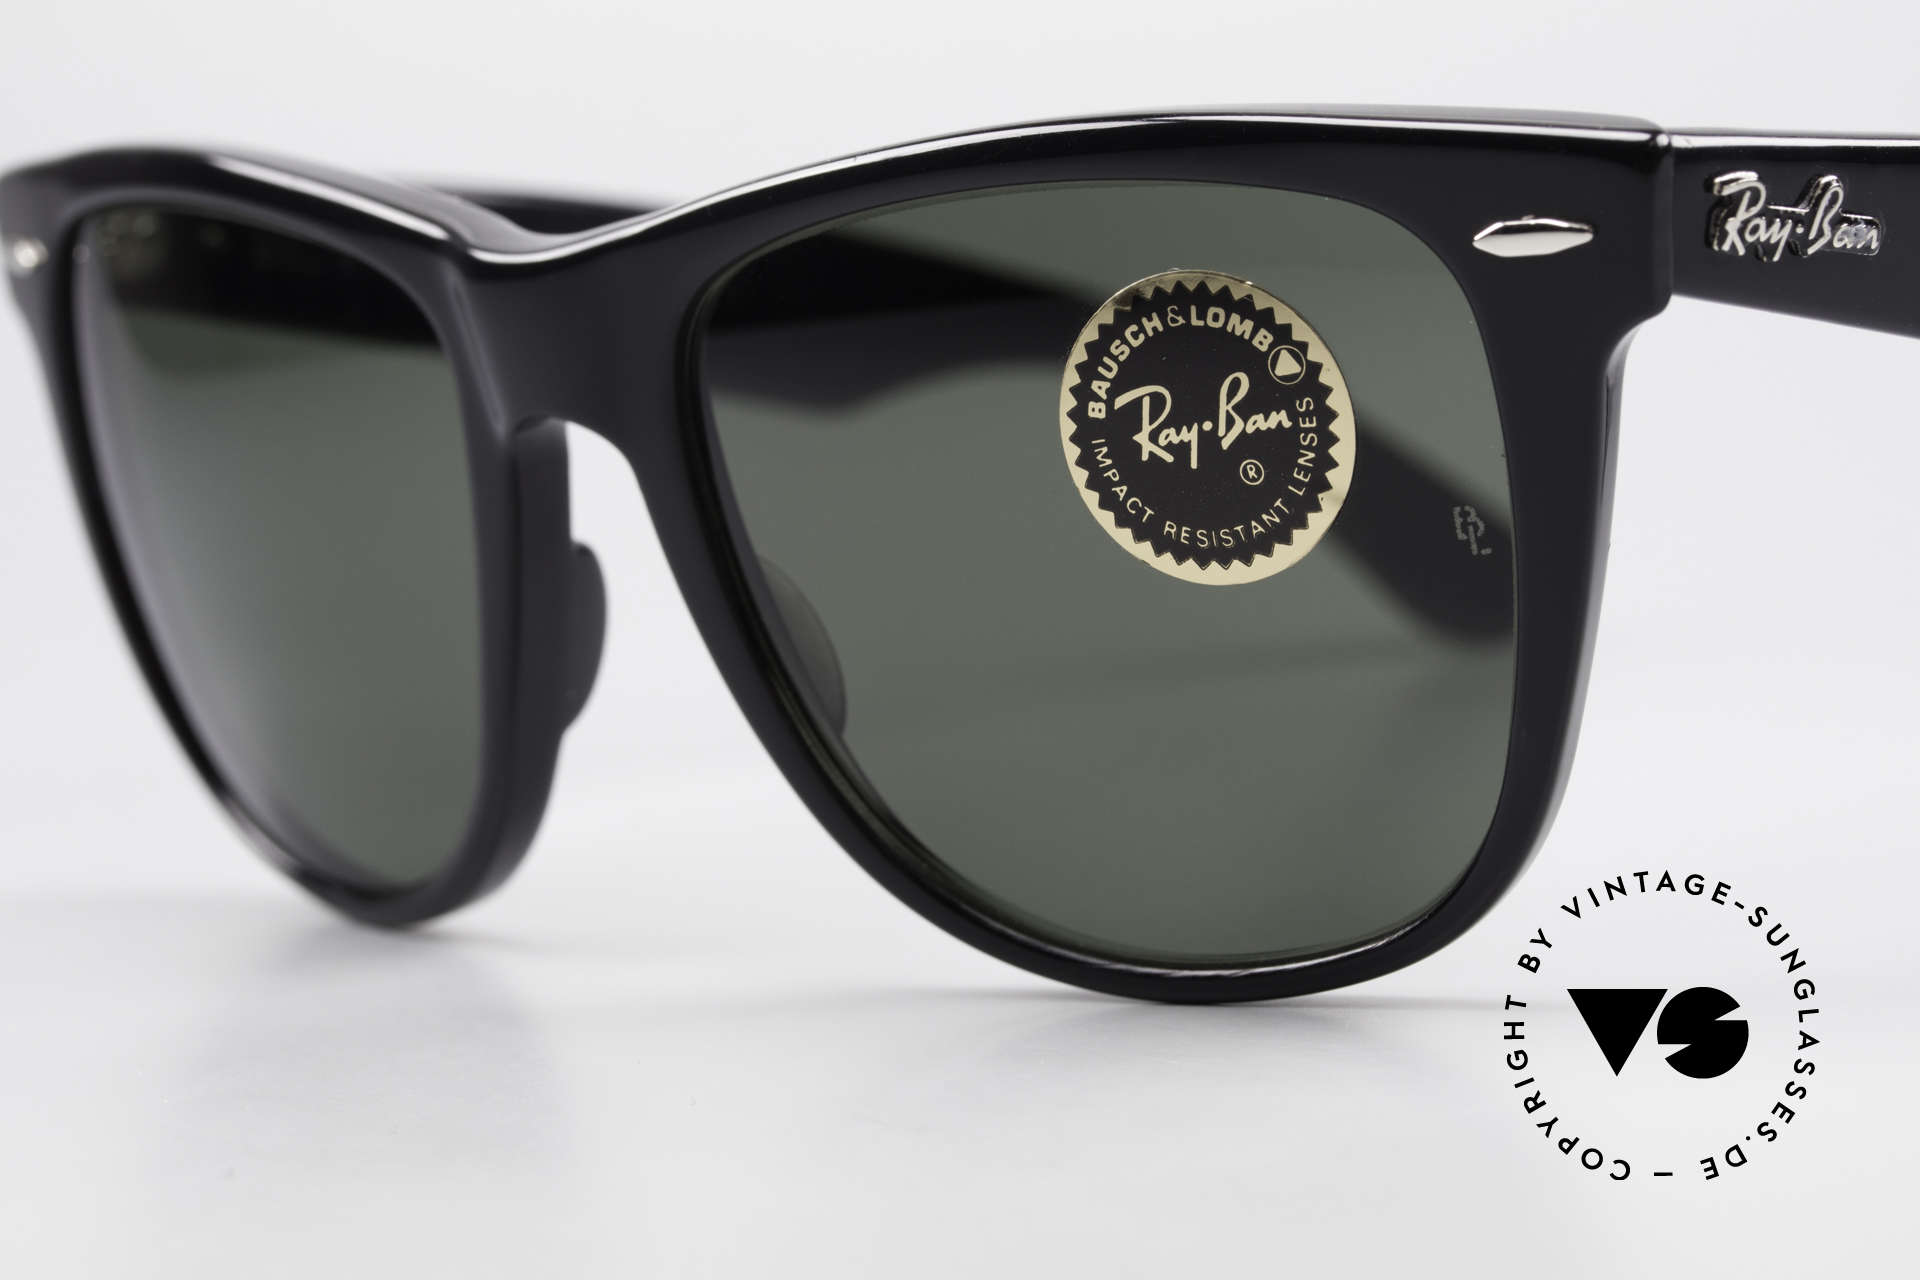 Ray Ban Wayfarer II JFK USA Vintage Sunglasses, unworn model; true rarity and collector's item, Made for Men